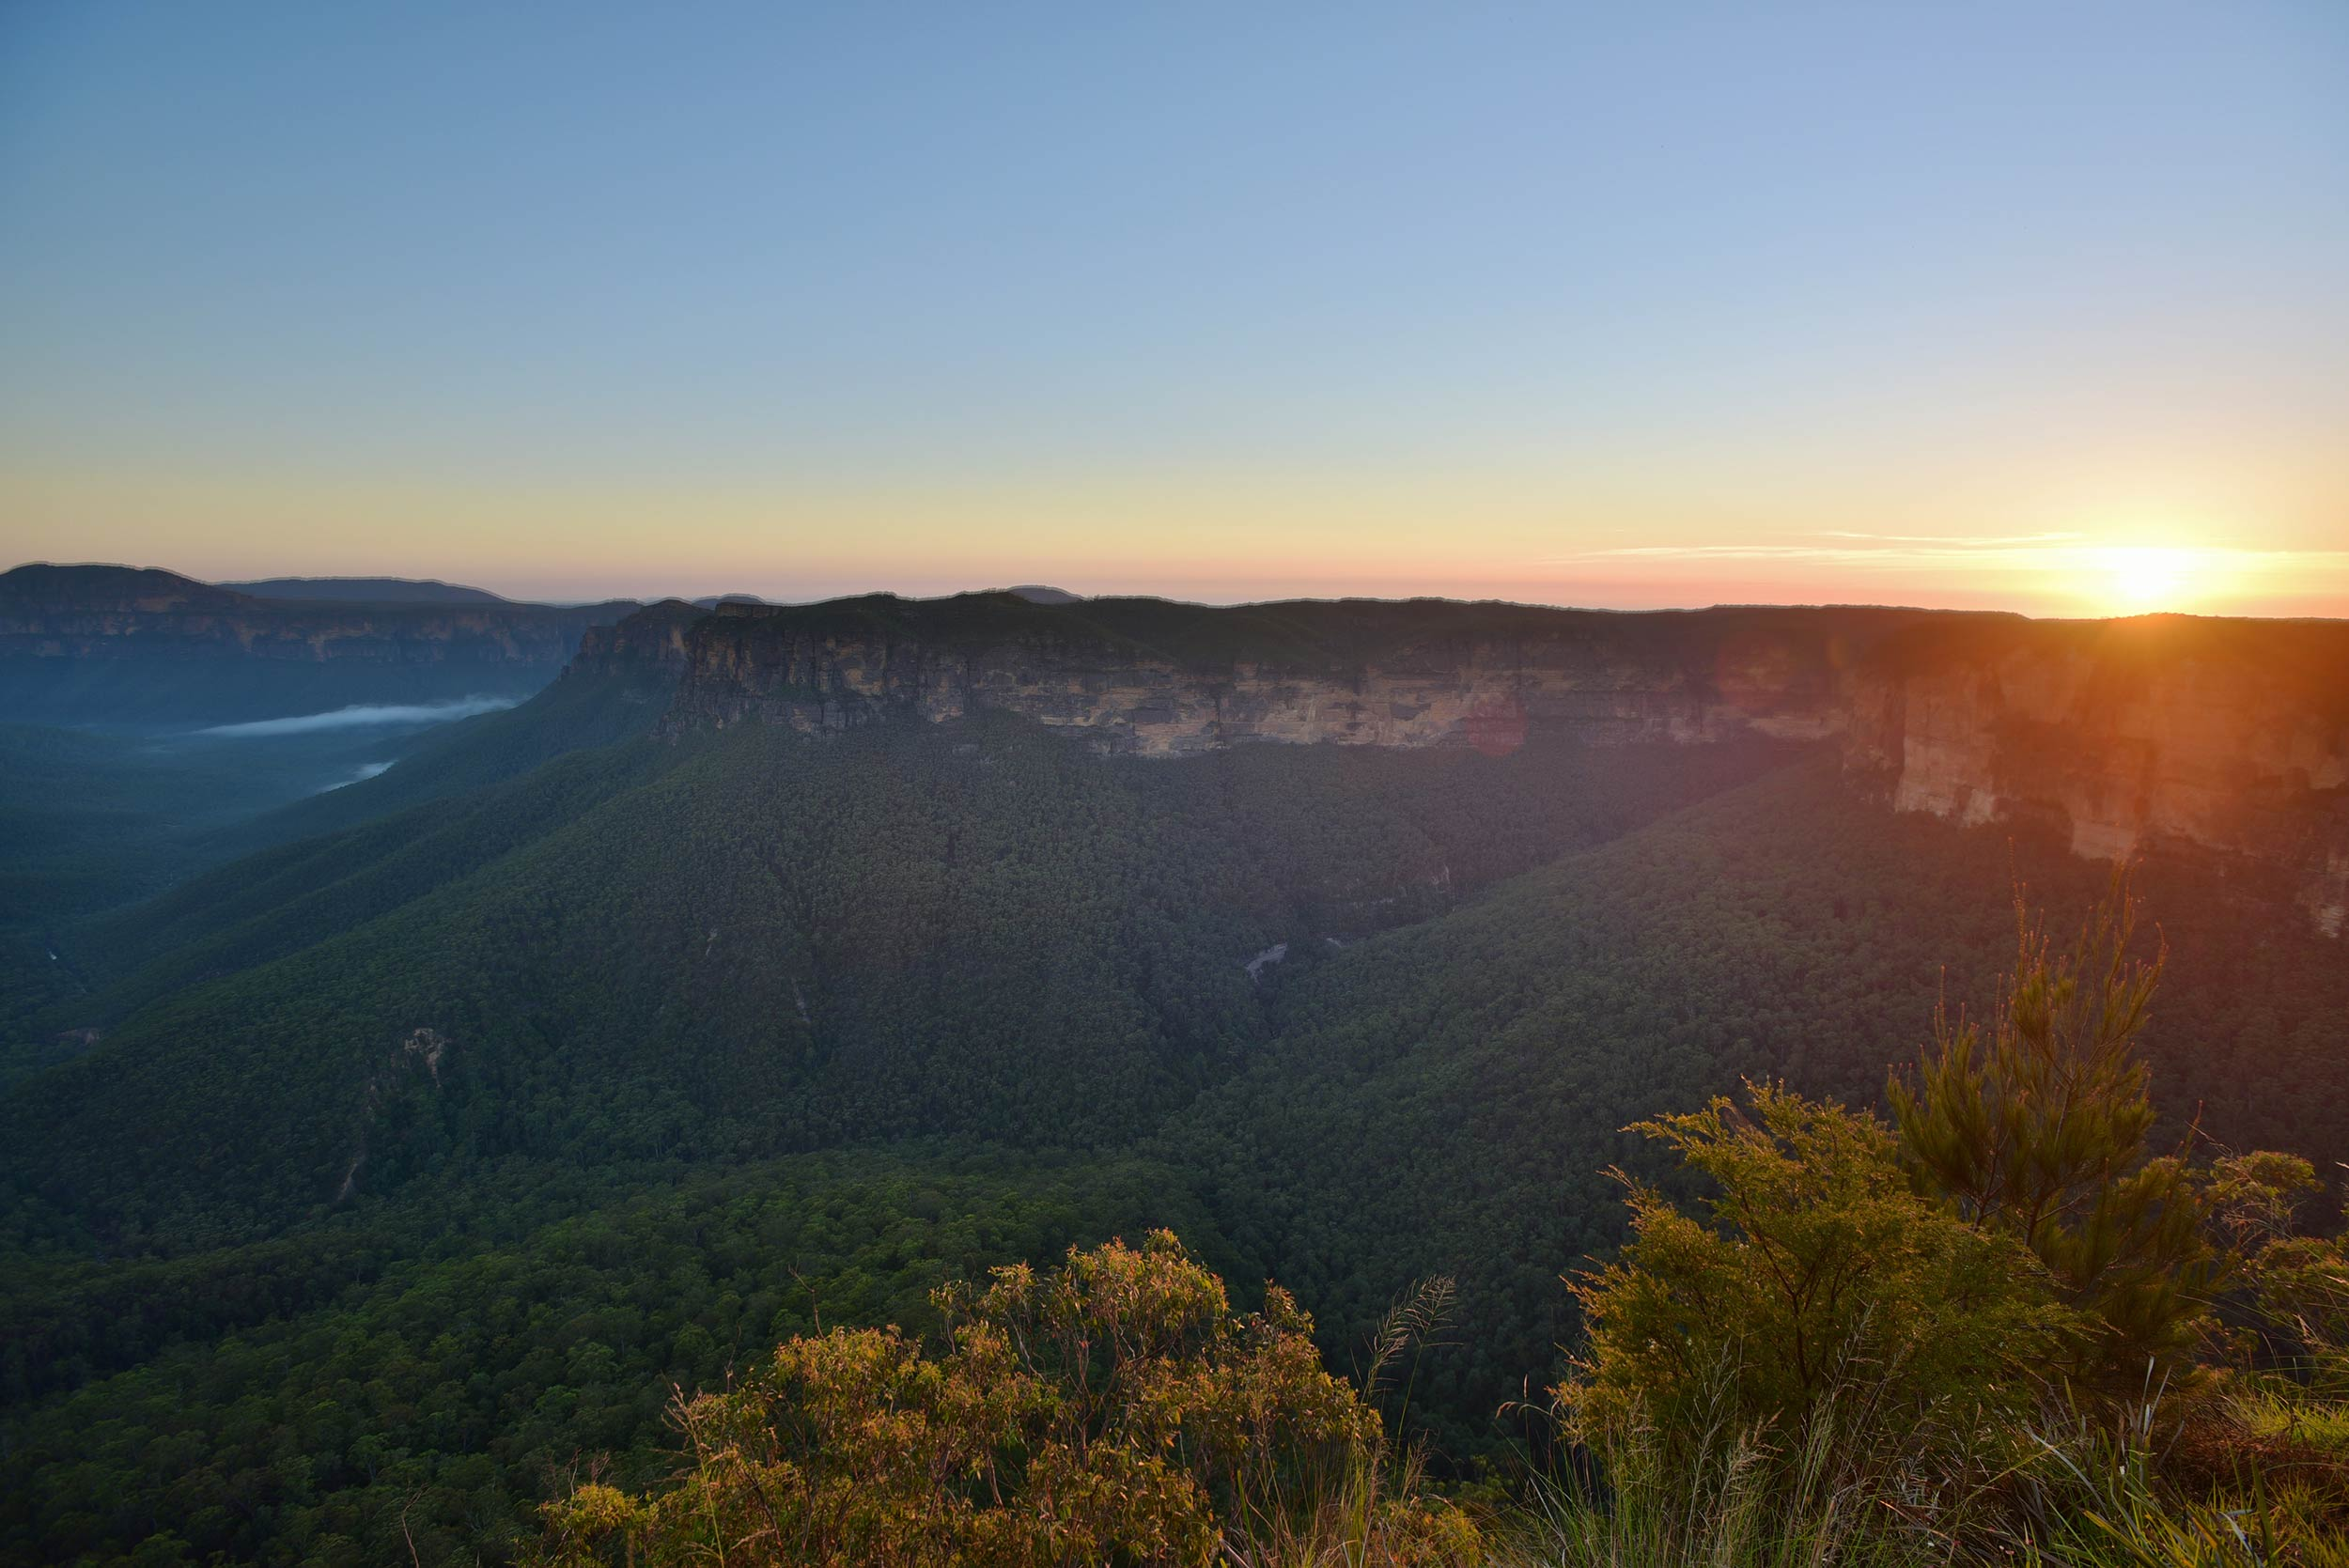 blue_mountains_sunset2.jpg